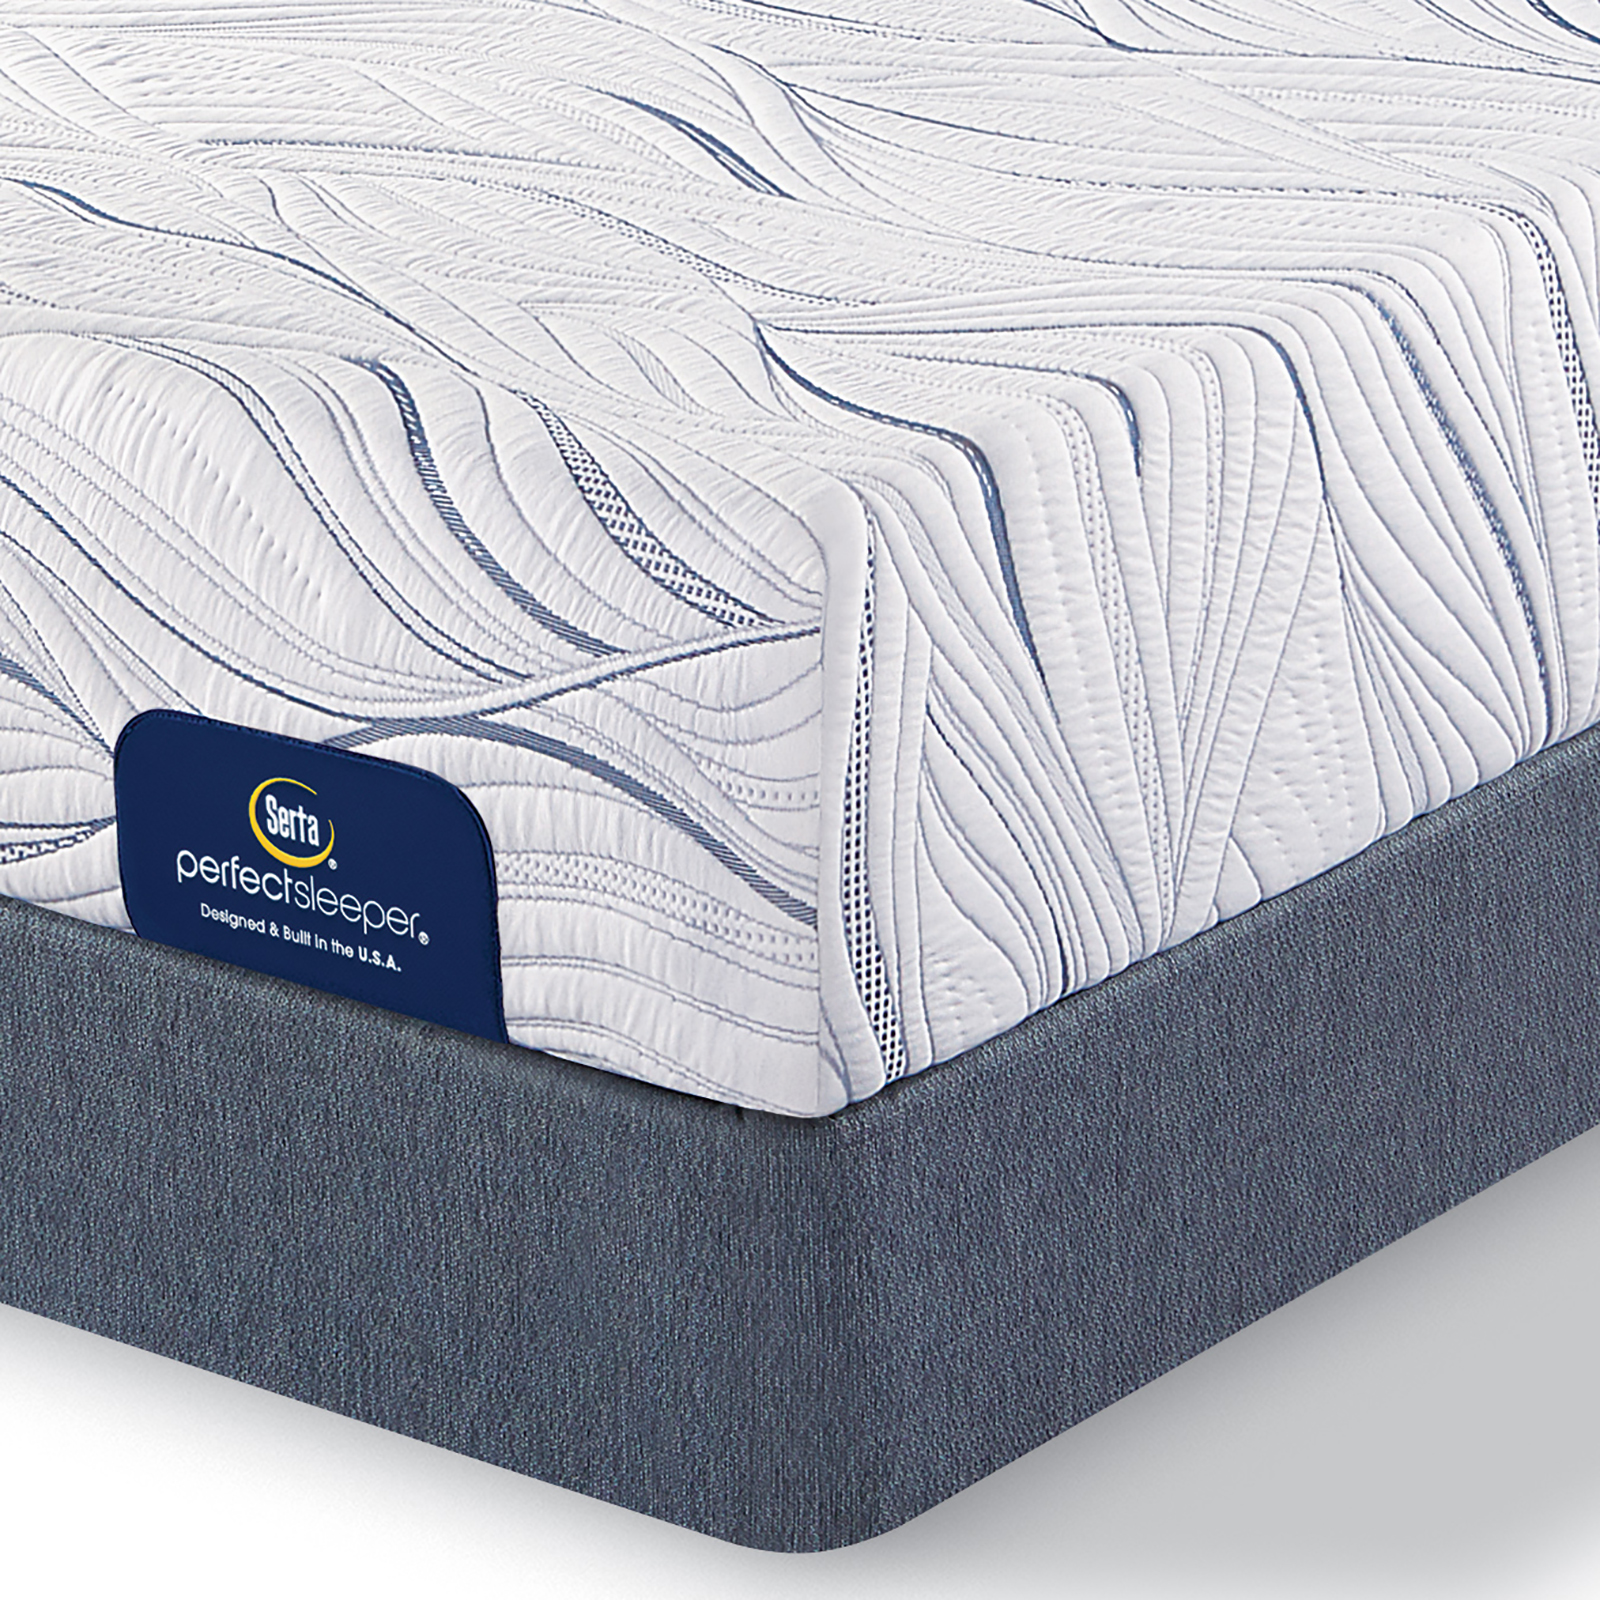 serta perfect sleeper stamford hill plush queen mattress